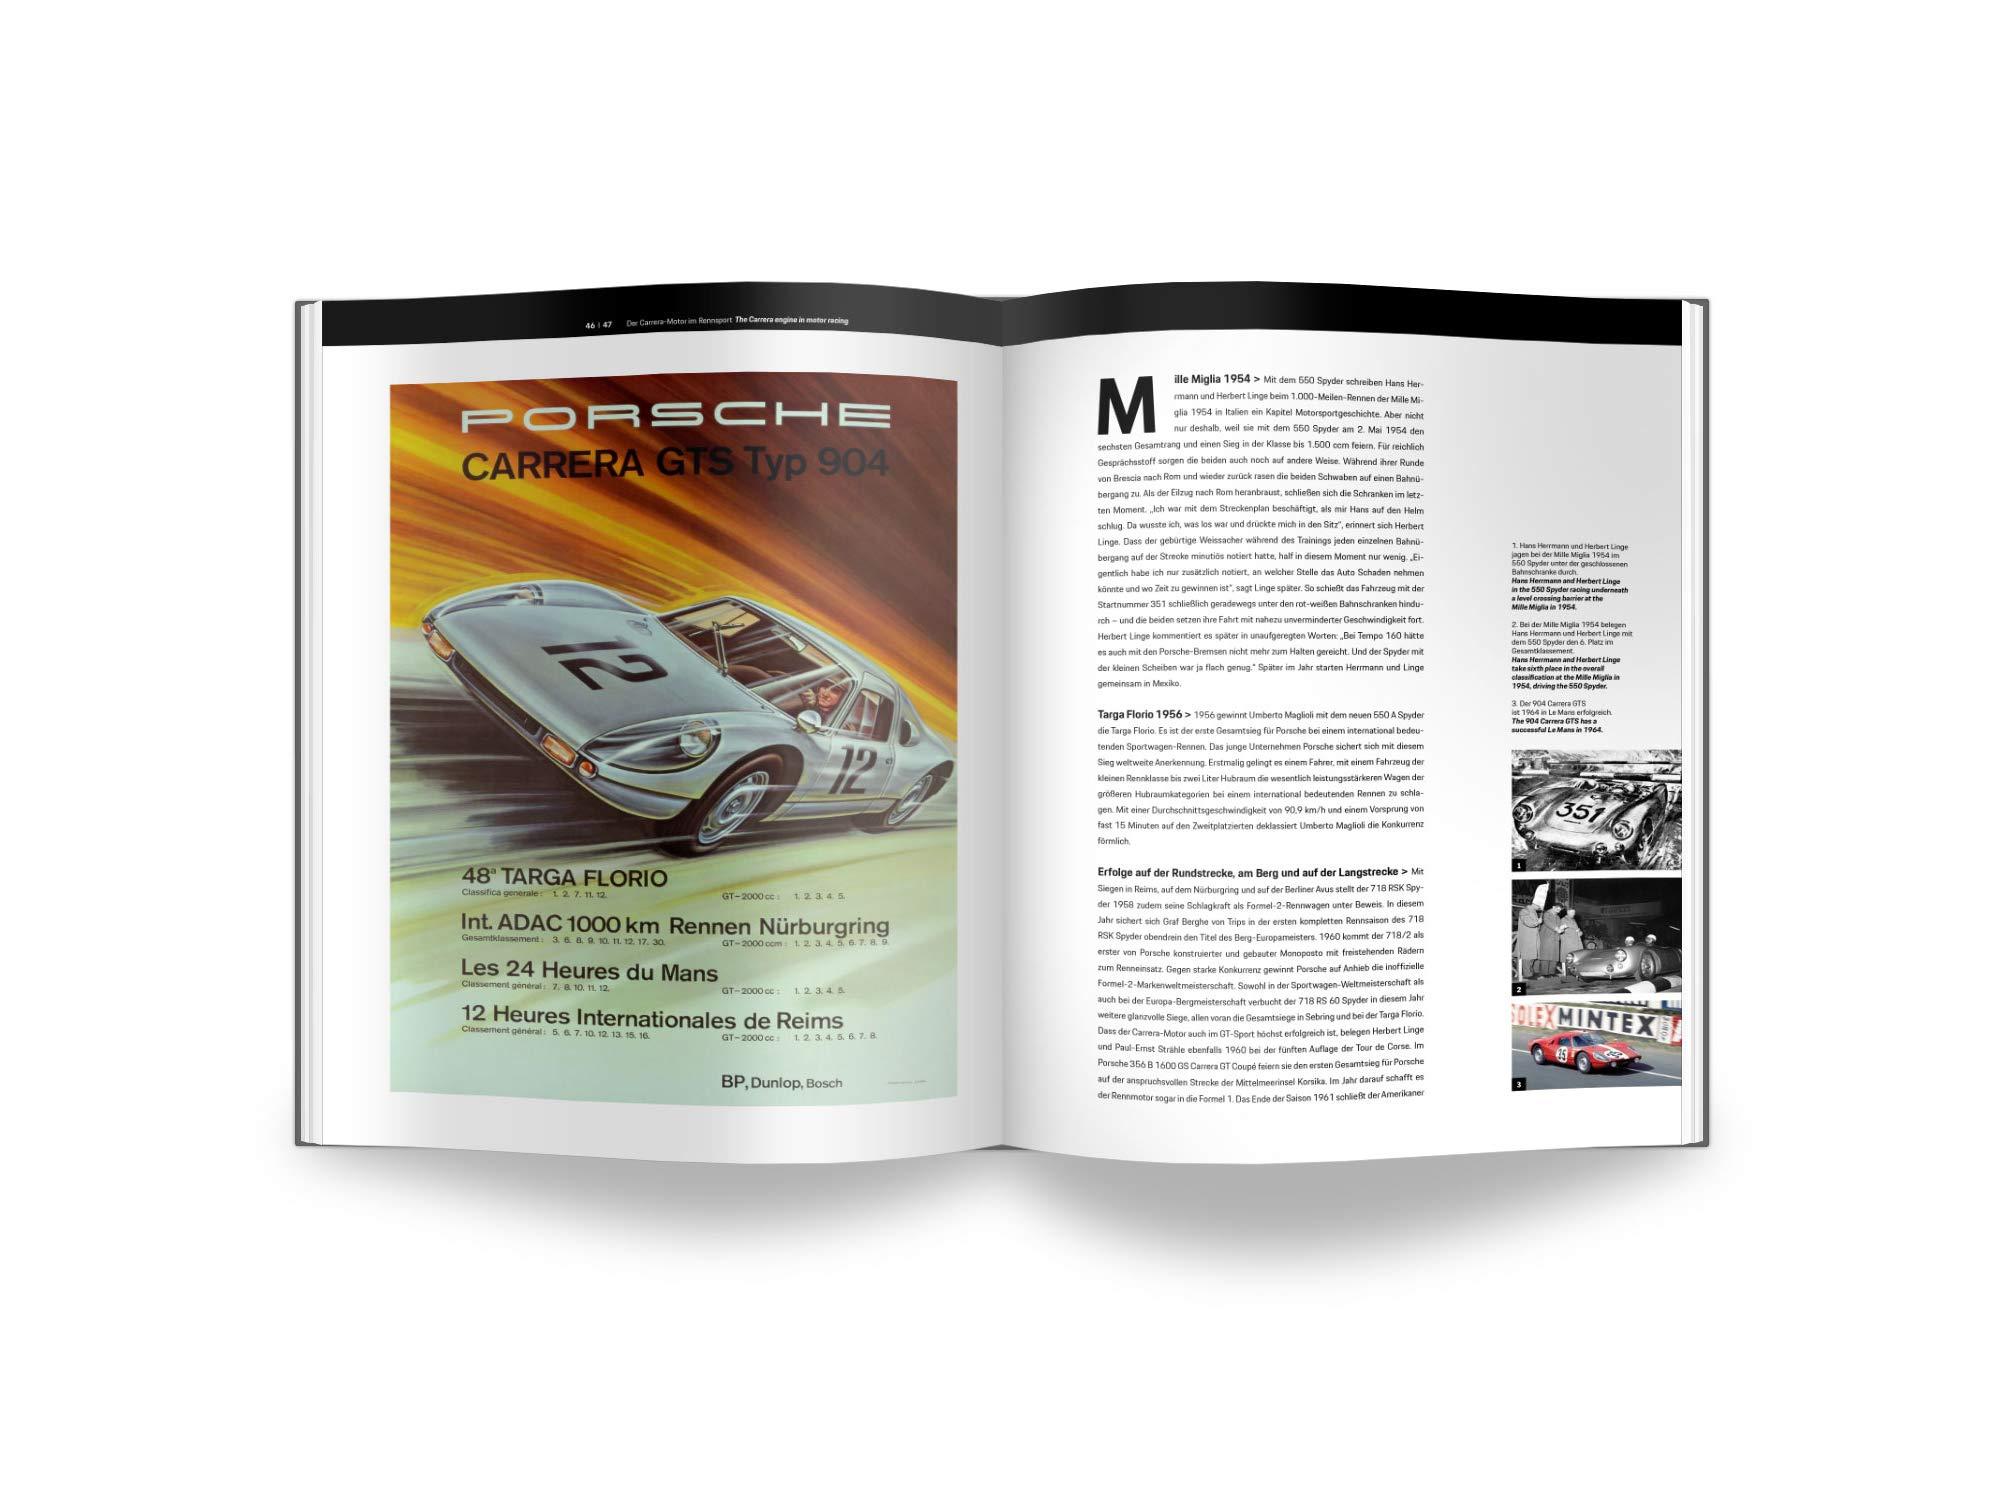 Porsche Carrera-Rennmotor: 4 Zylinder Boxermodell vom Typ 547: Amazon.es: PORSCHE Museum: Libros en idiomas extranjeros